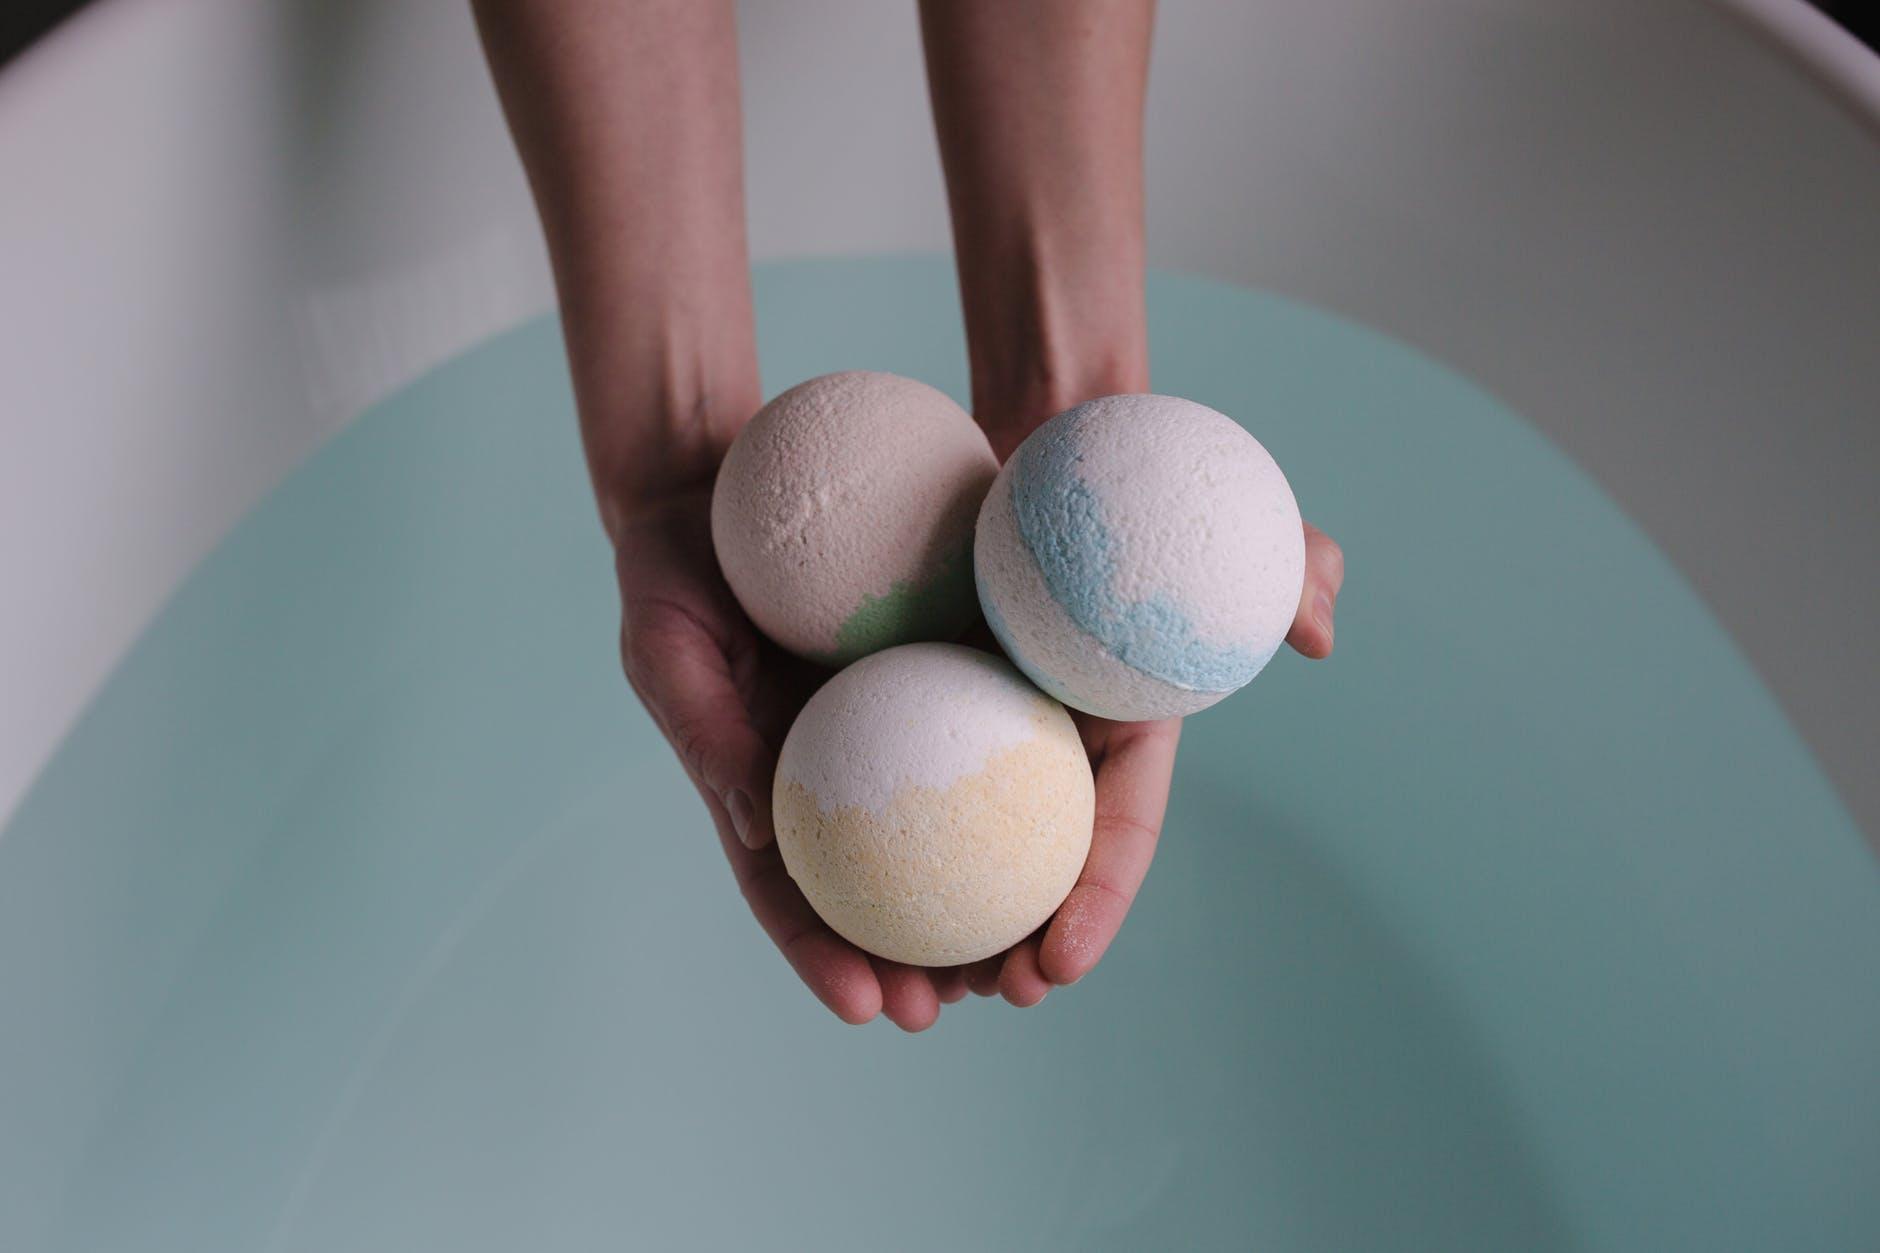 person holding three bath balls